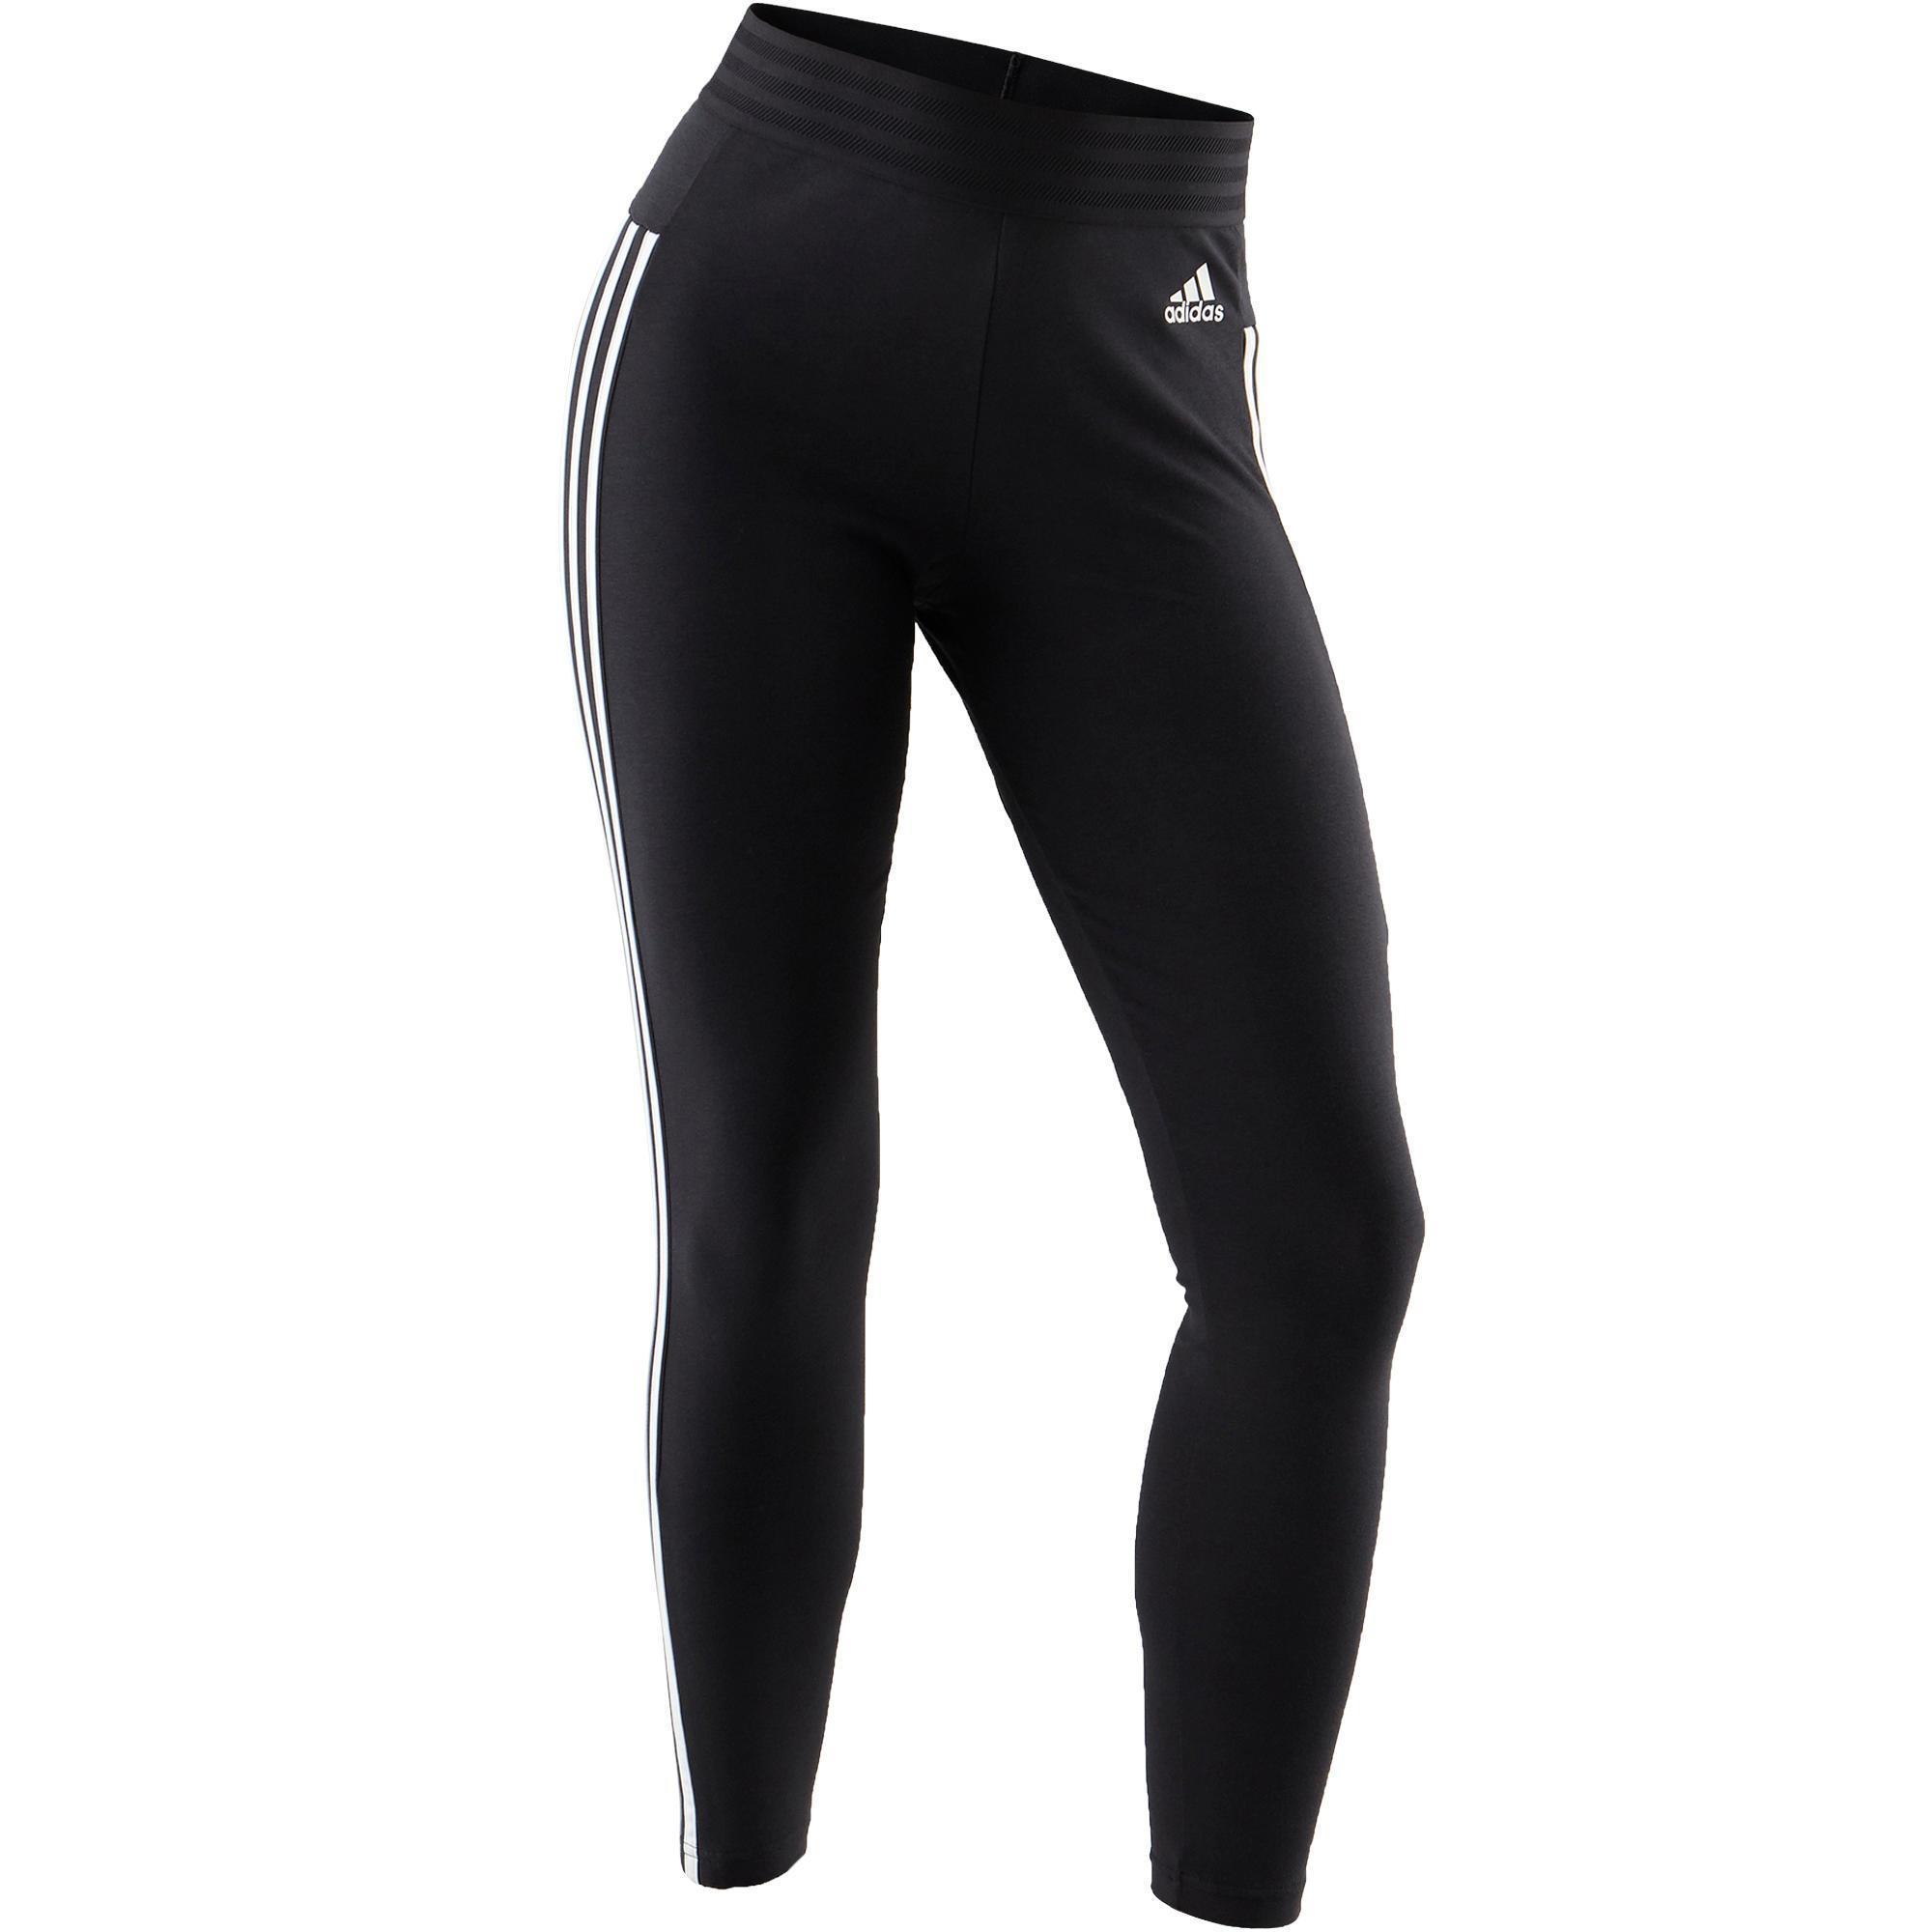 db2635e5b37 Adidas Legging Adidas 3S 500 pilates lichte gym dames zwart/wit kopen met  voordeel